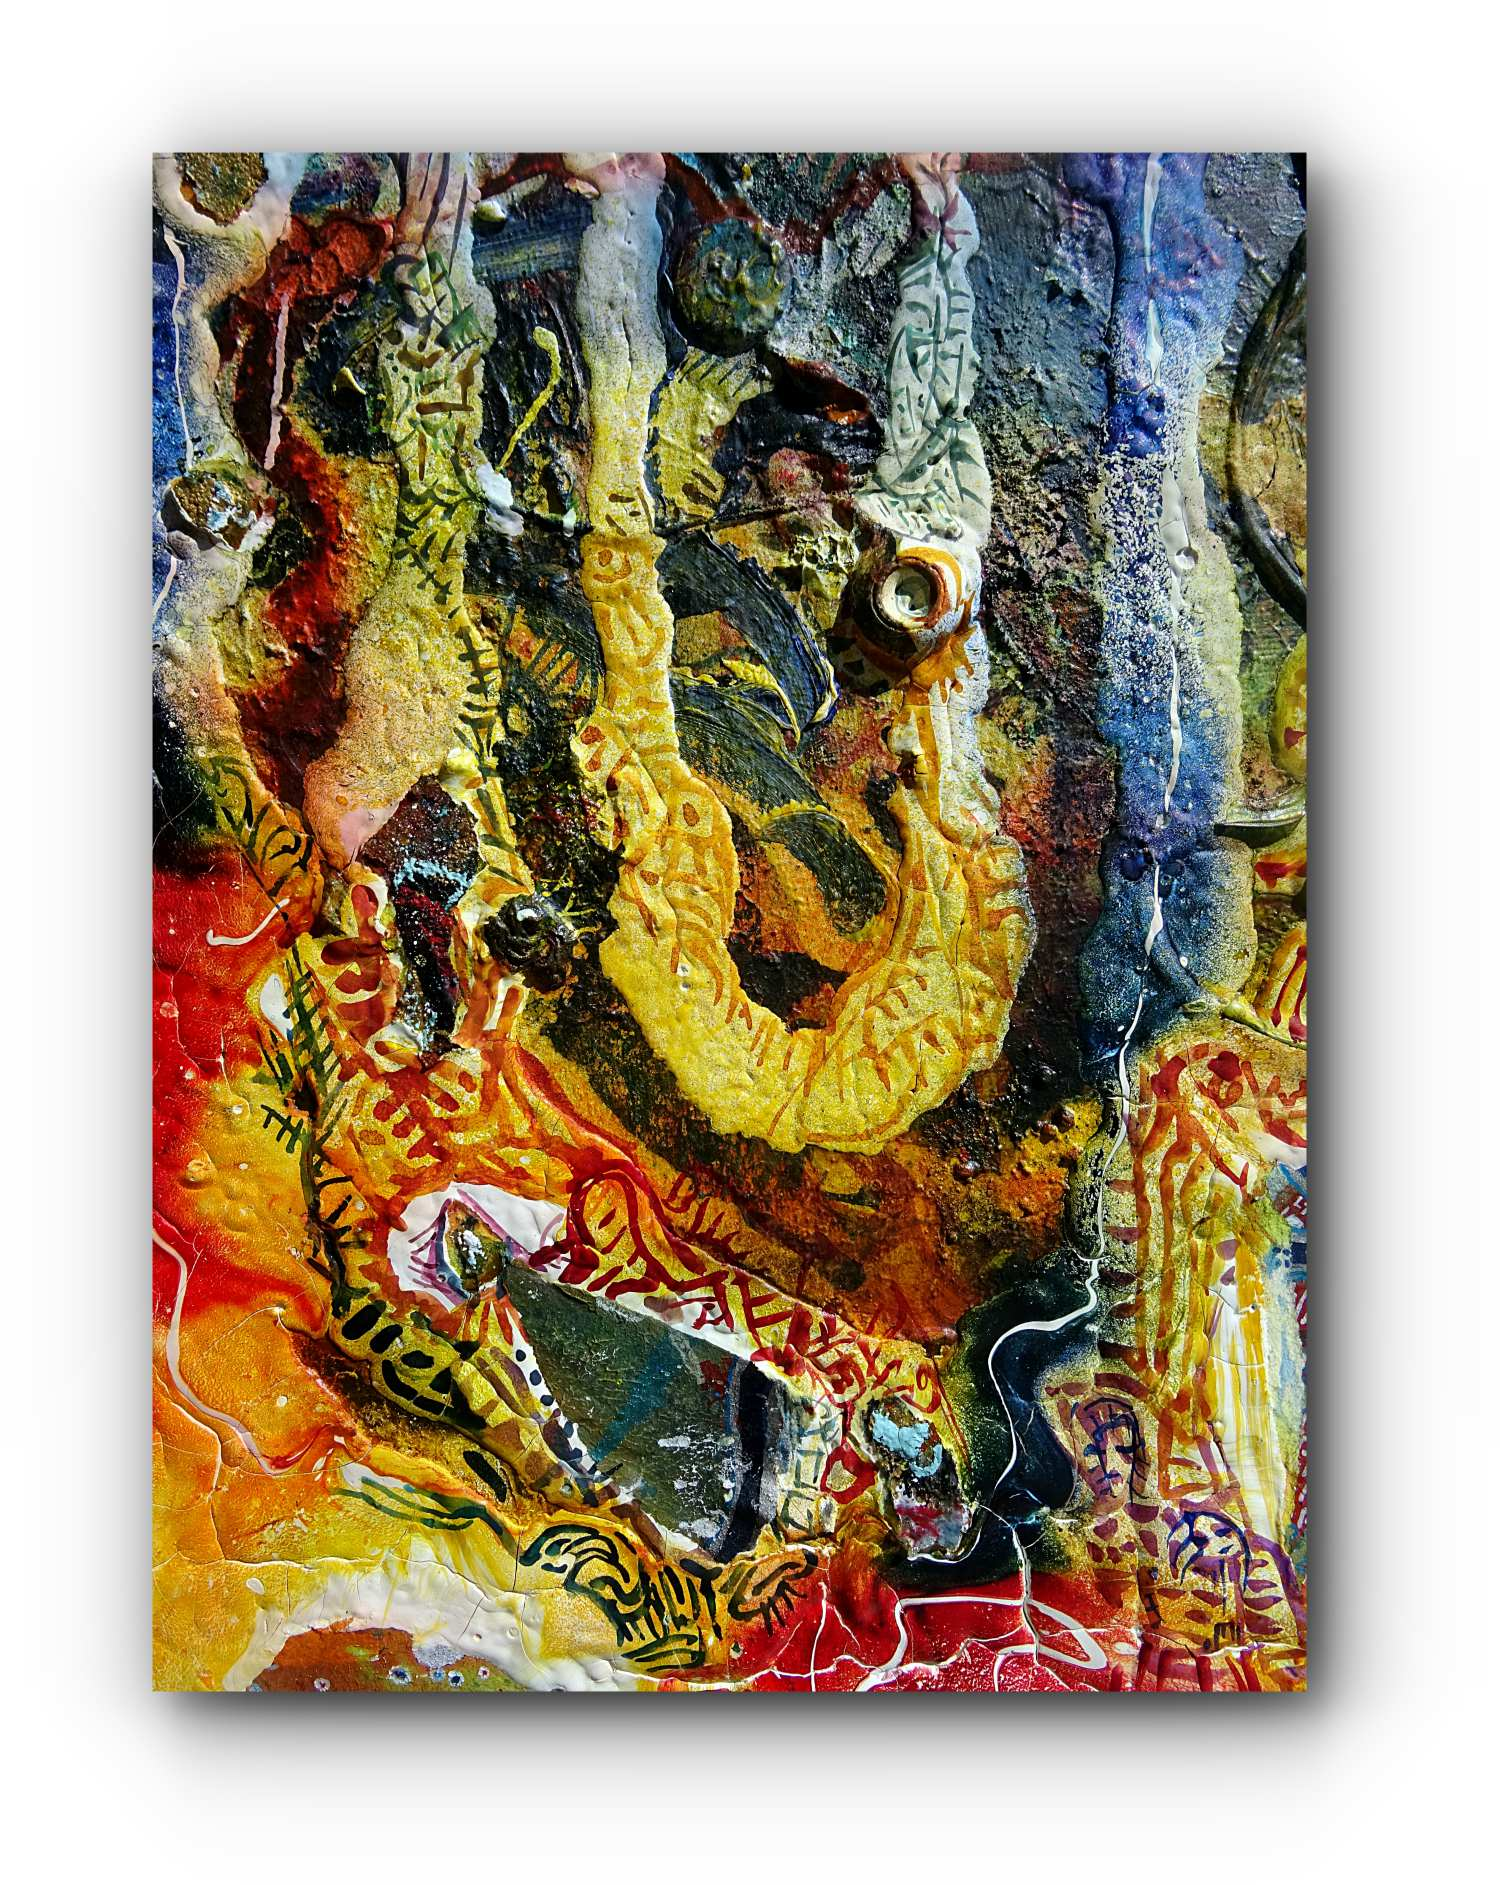 painting-detail-8-kiss-artist-duo-ingress-vortices.jpg